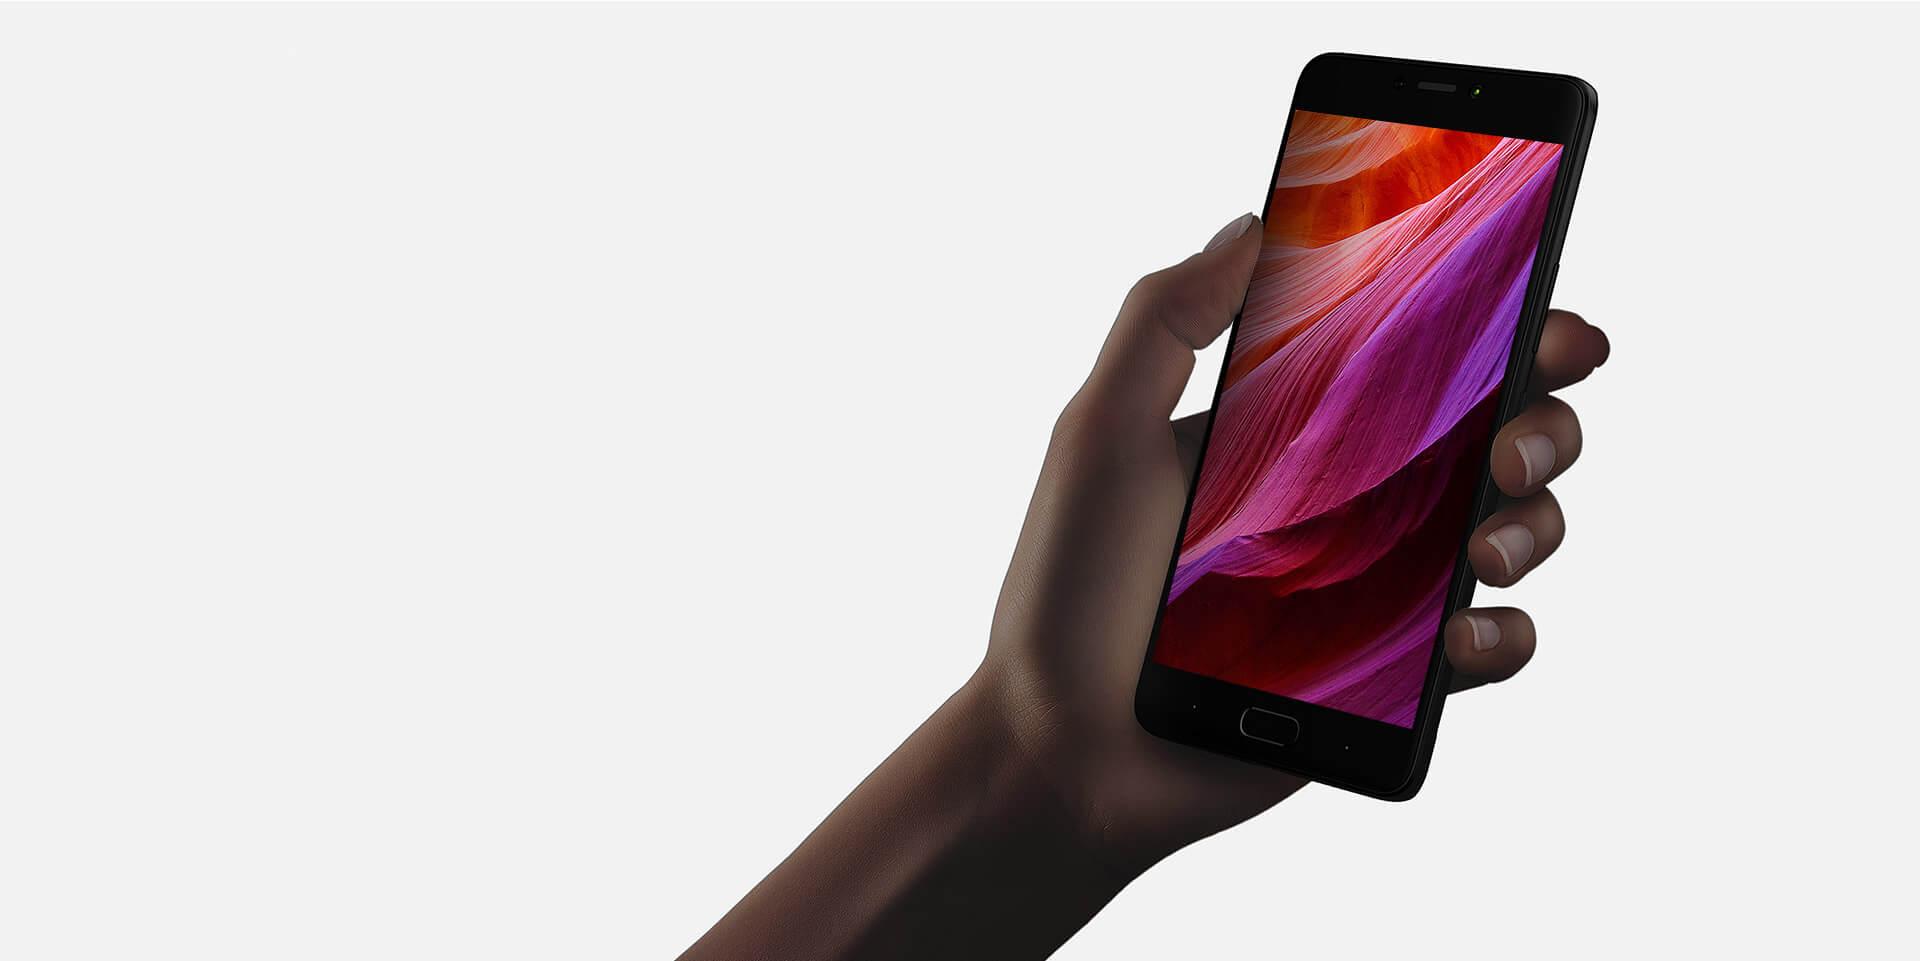 Infinix Note 4 X572 Dual SIM - 16GB, 2GB RAM, 4G LTE - Gold